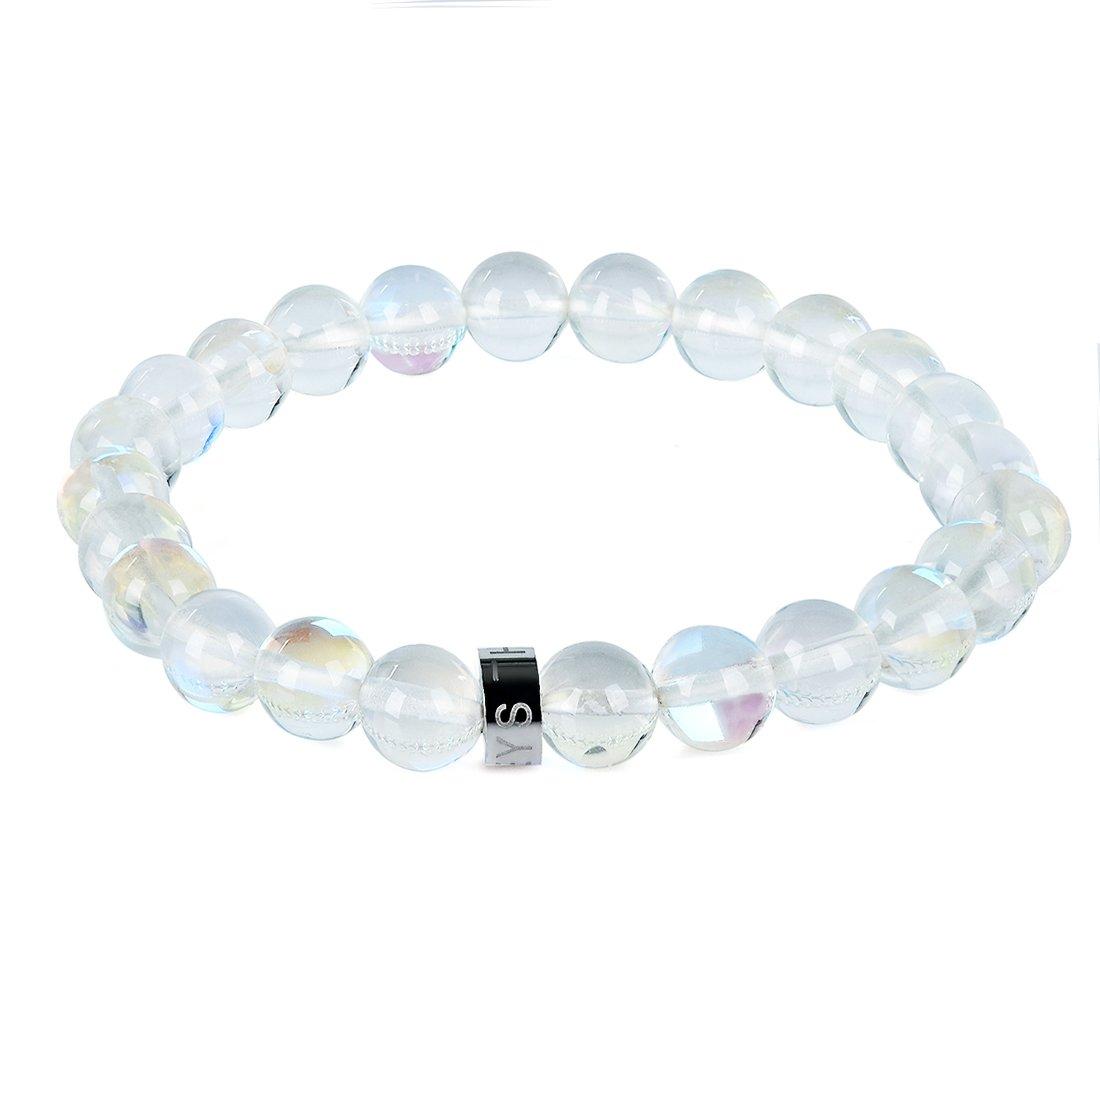 Three Keys Jewelry 8mm Synthetic Moonstone Beads Bracelet Handmade Healing Beads Birthstone Meditation Energy Stretch Bracelet Unisex 7'' GB-005